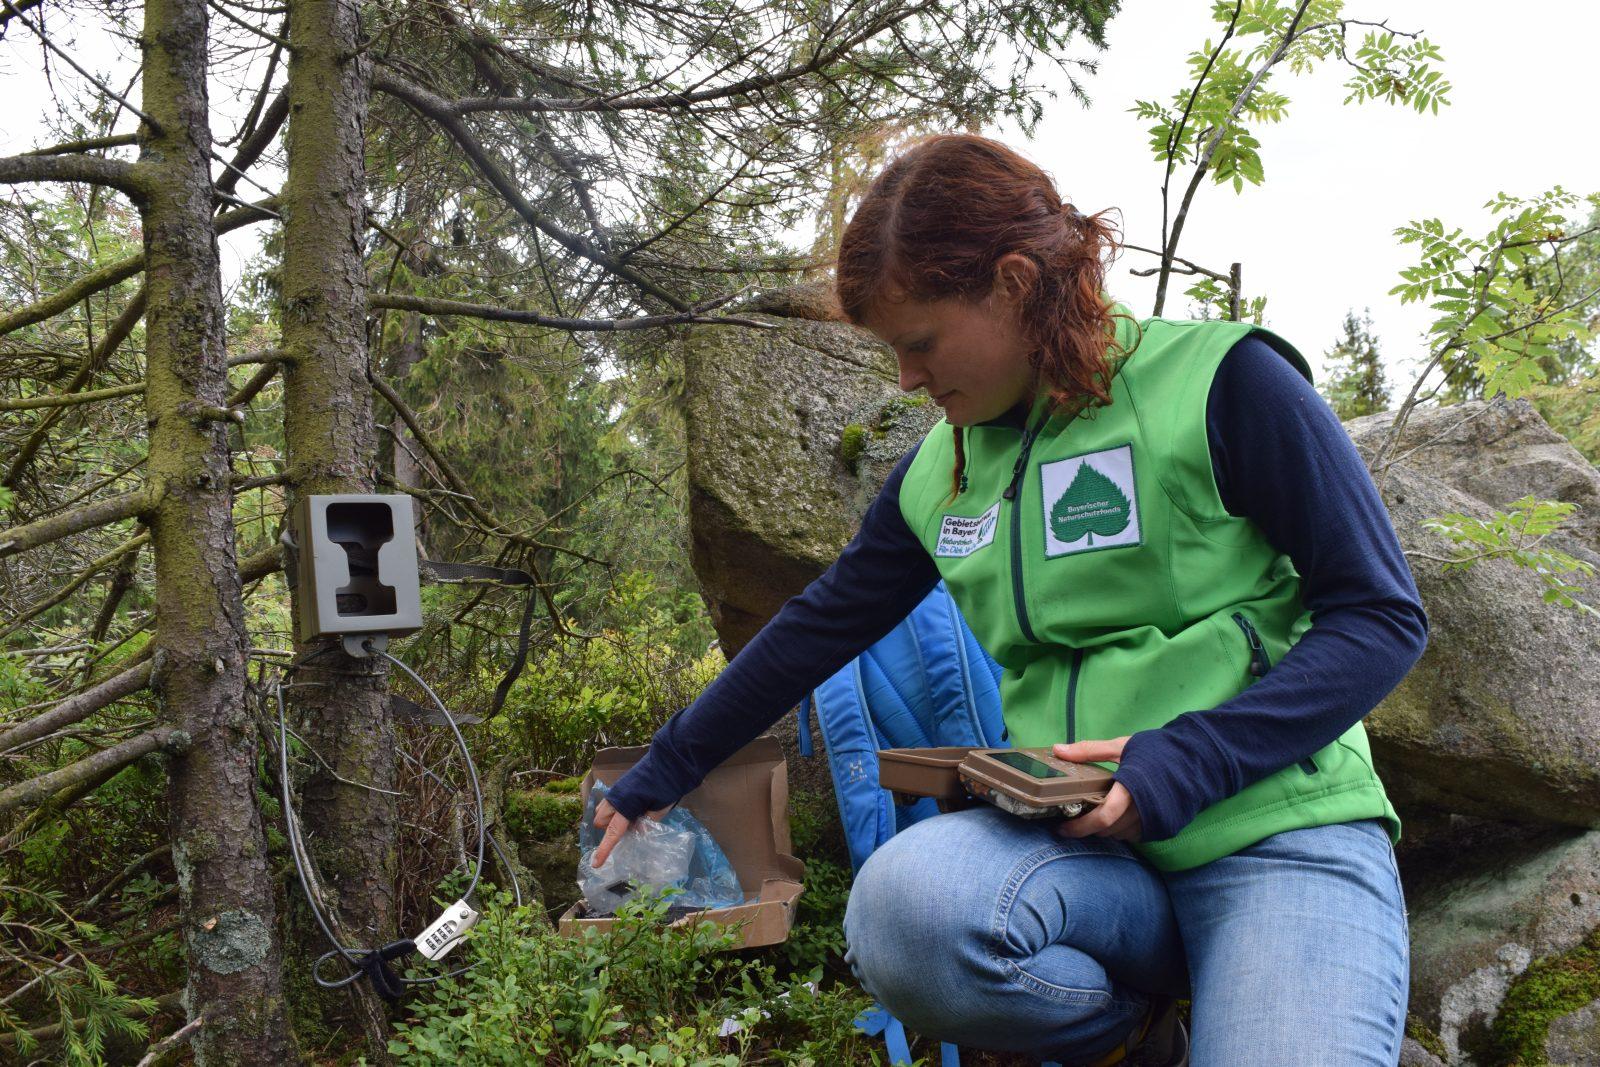 Gut erkennbar an der grünen Weste: die Gebietsbetreuerin des Naturparks Fichtelgebirge, Stefanie Jessolat, Bildrechte: Naturpark Fichtelgebirge